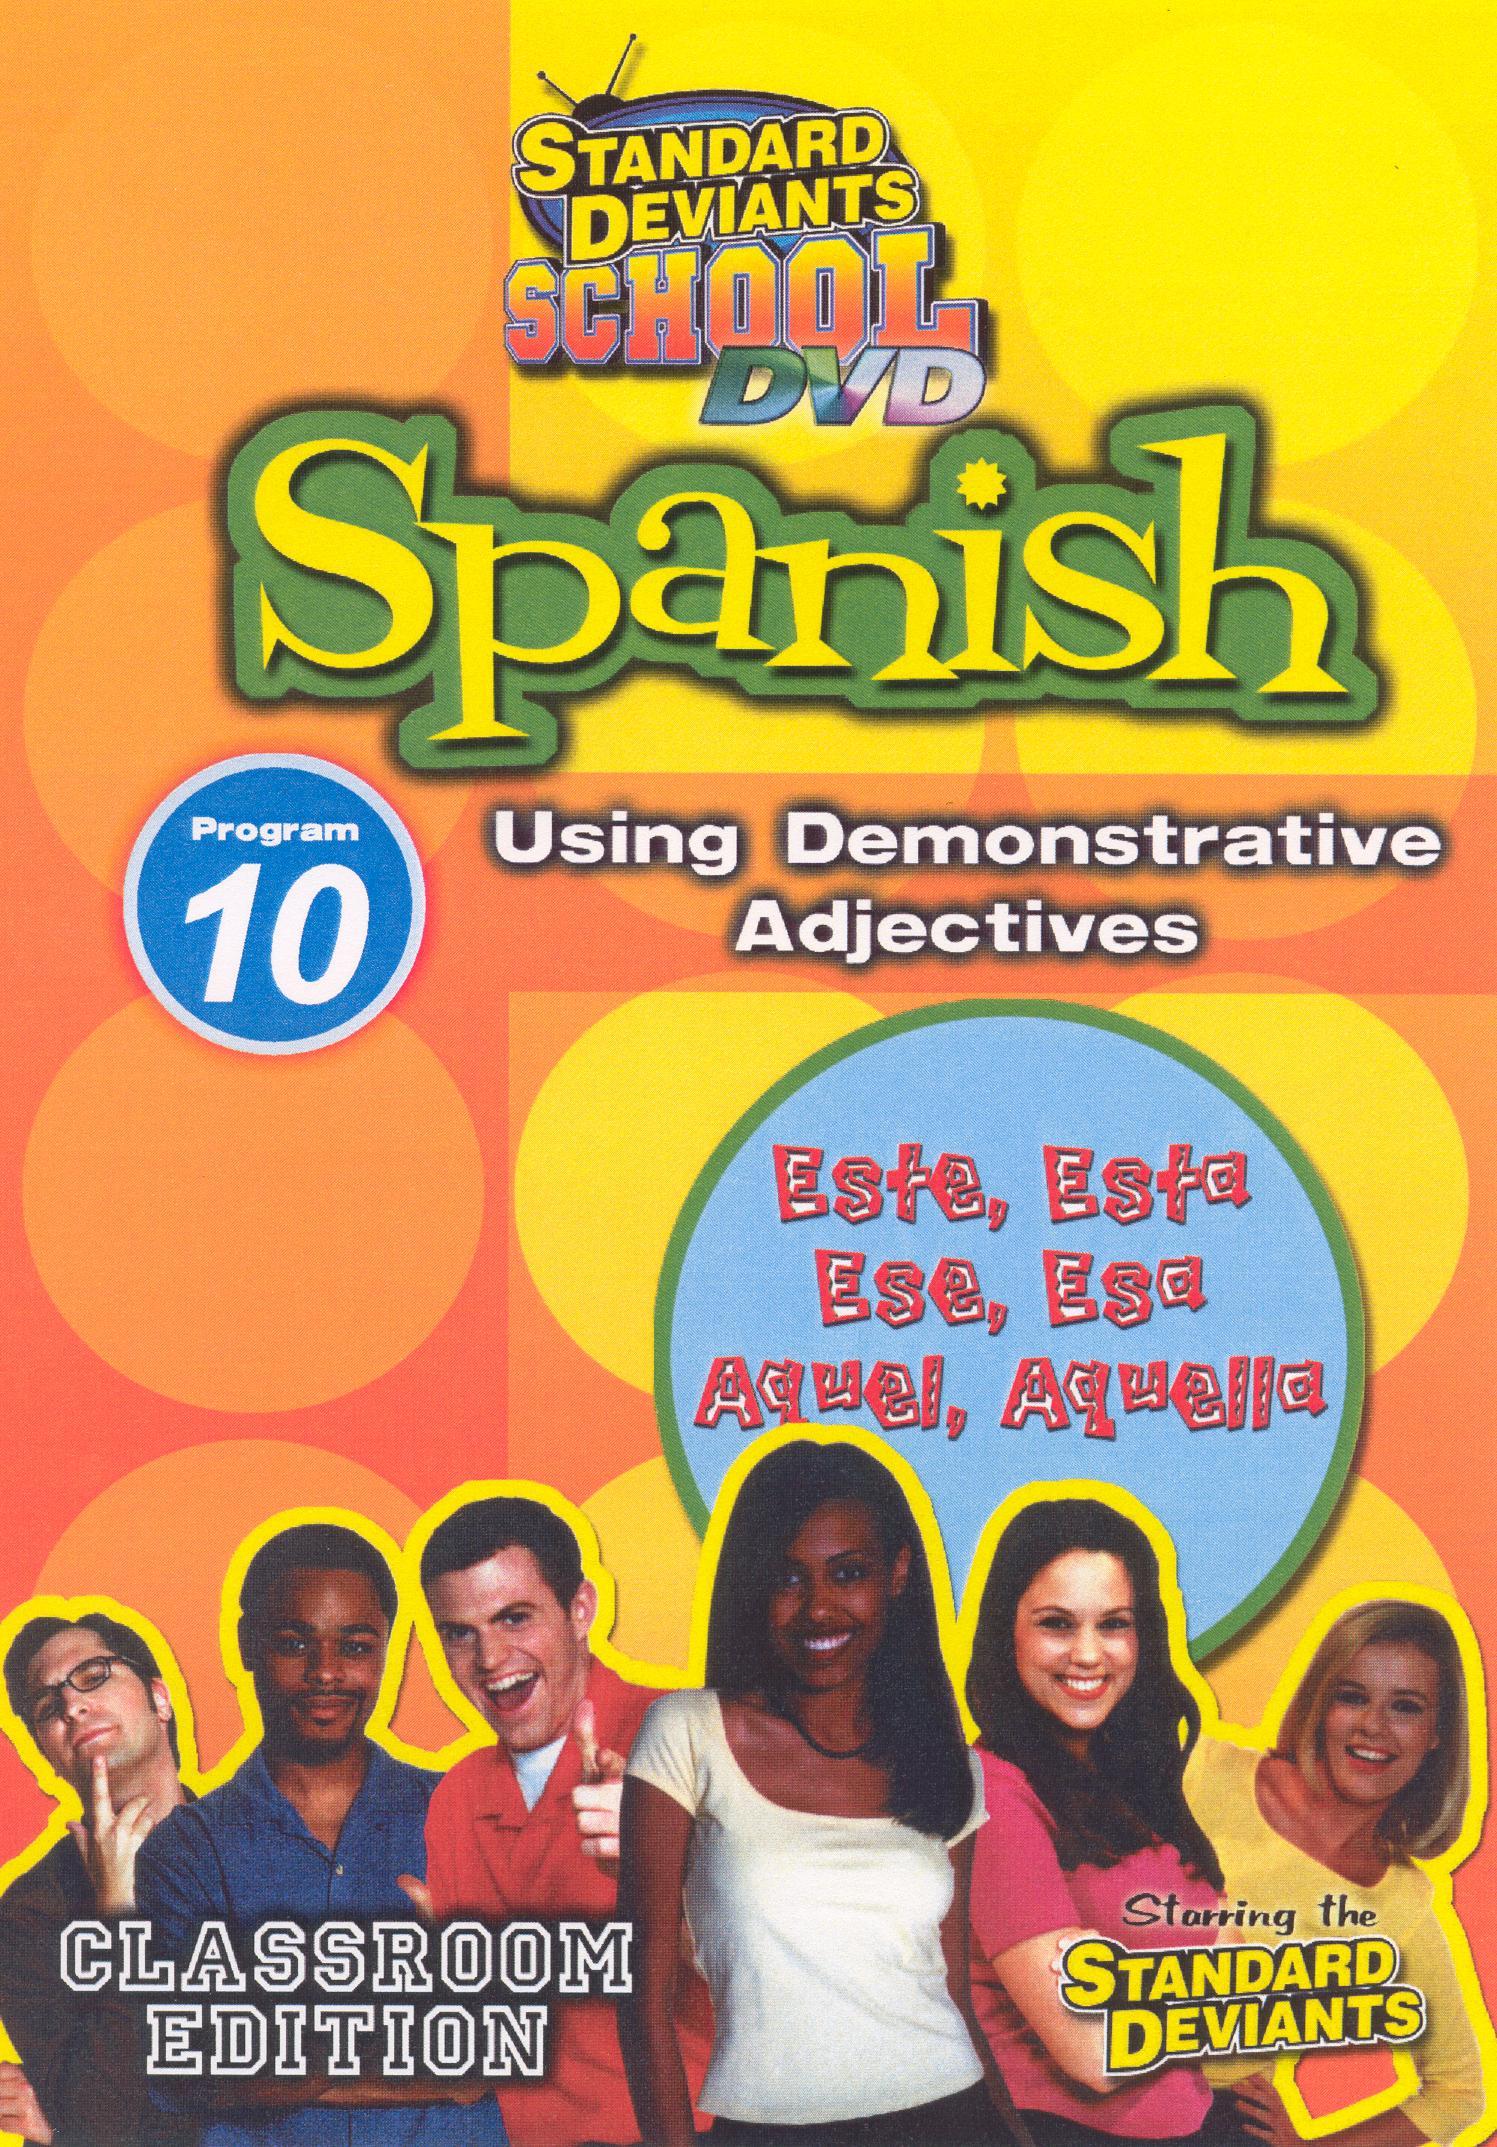 Standard Deviants School: Spanish, Program 10 - Using Demonstrative Adjectives